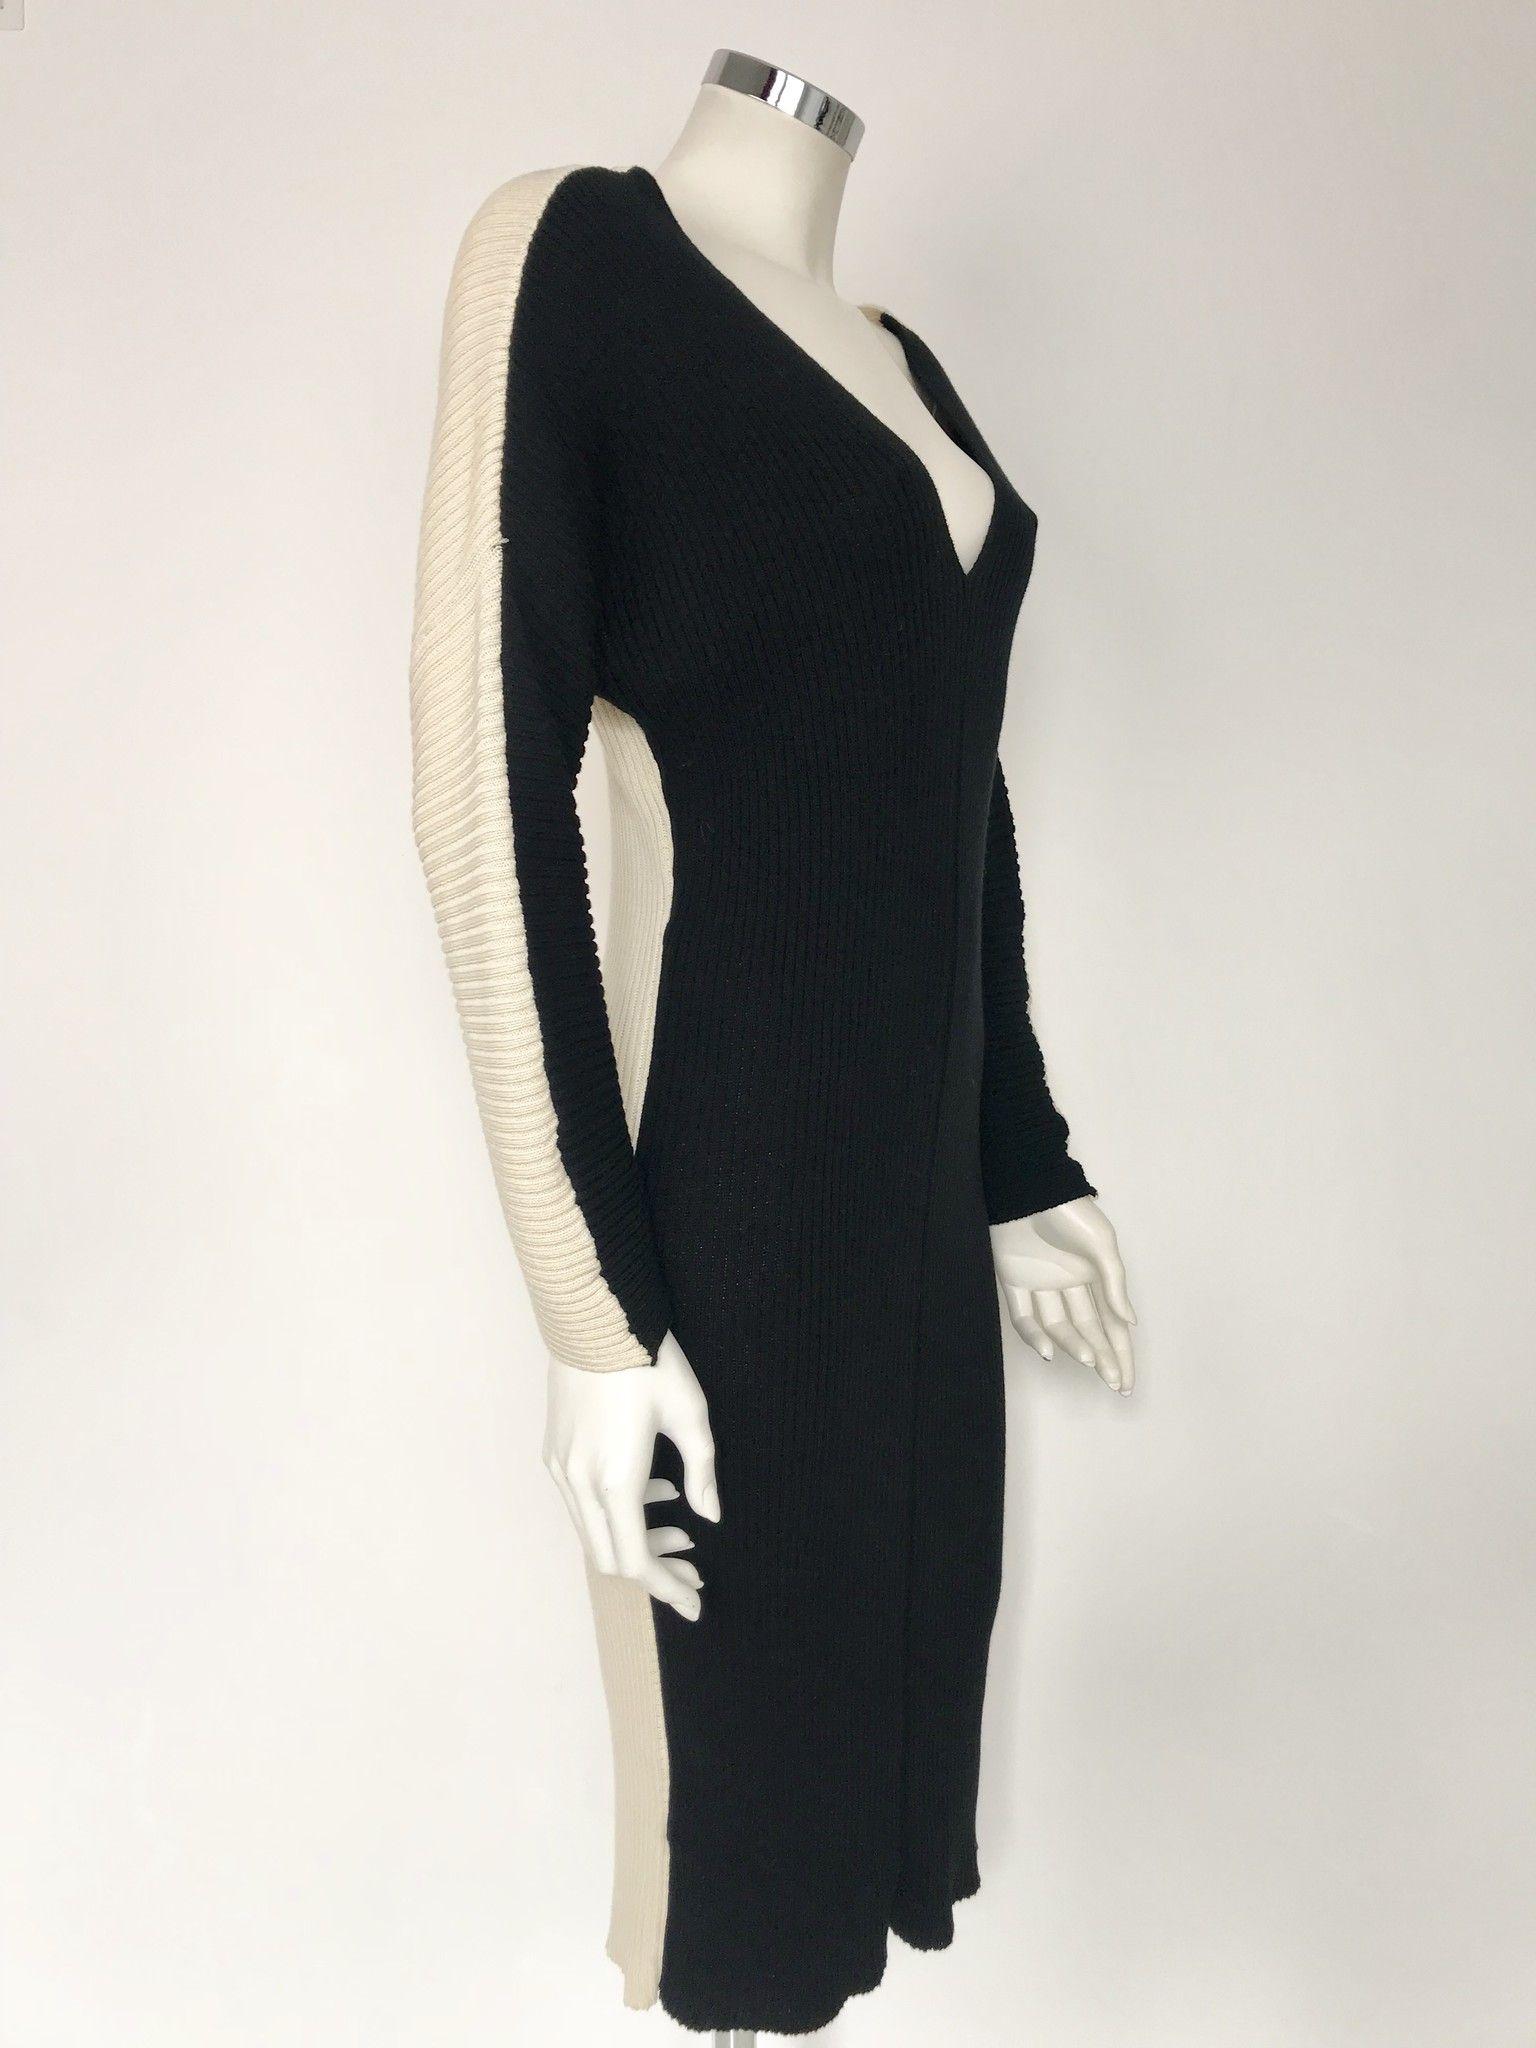 LADY BUG Midi Two-Tone Dress Cod. 7002T